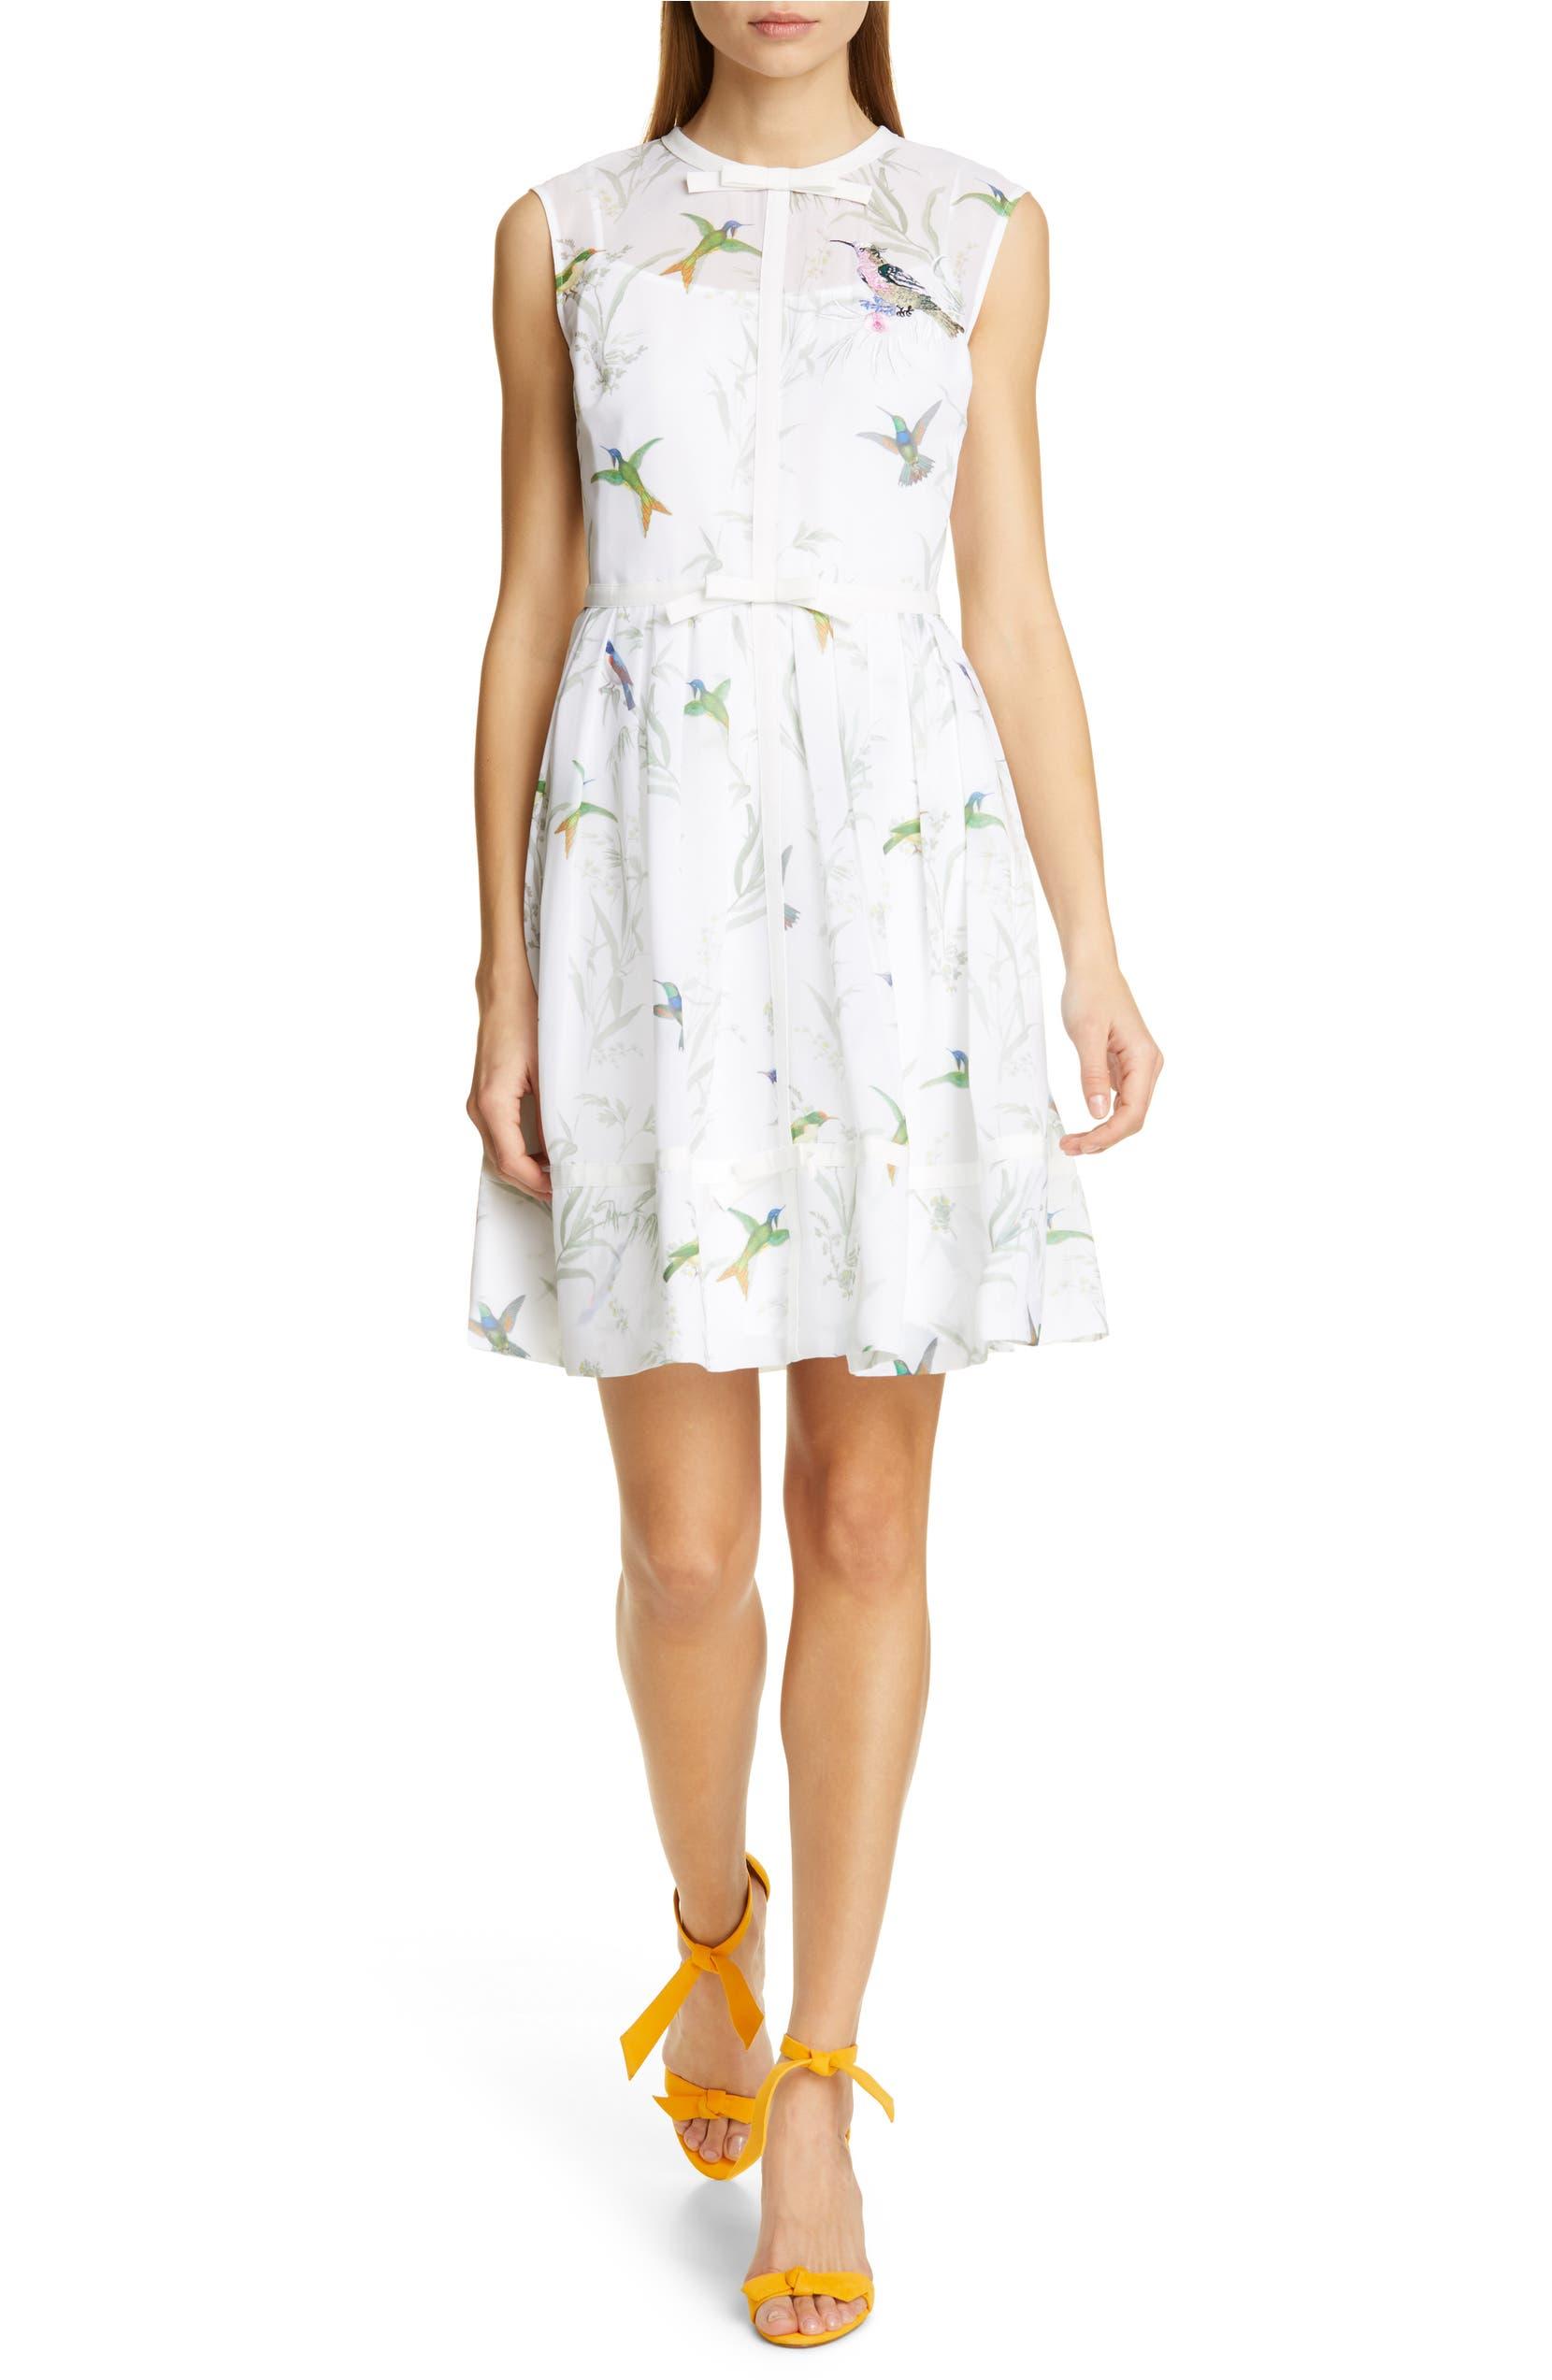 6421ecd8530 Ted Baker London Aleksa Fortune Fit   Flare Dress